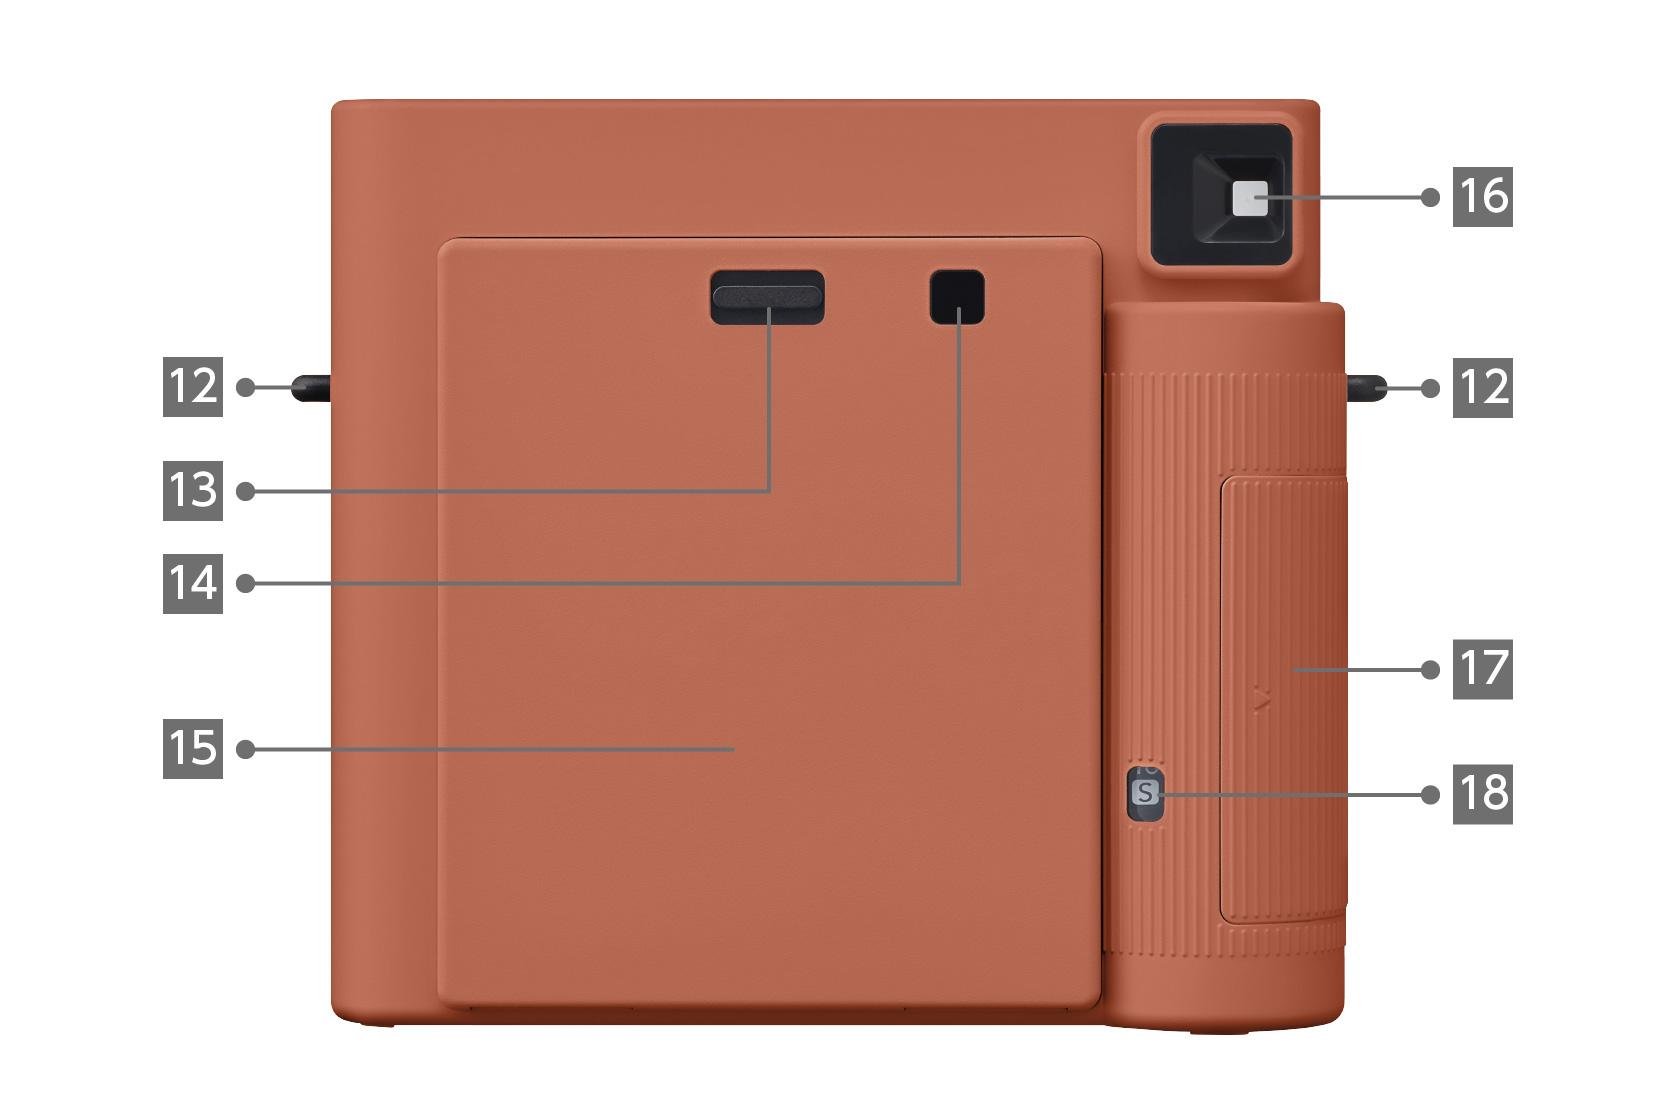 [photo] INSTAX SQUARE SQ1 camera in Terracotta Orange color, Back view